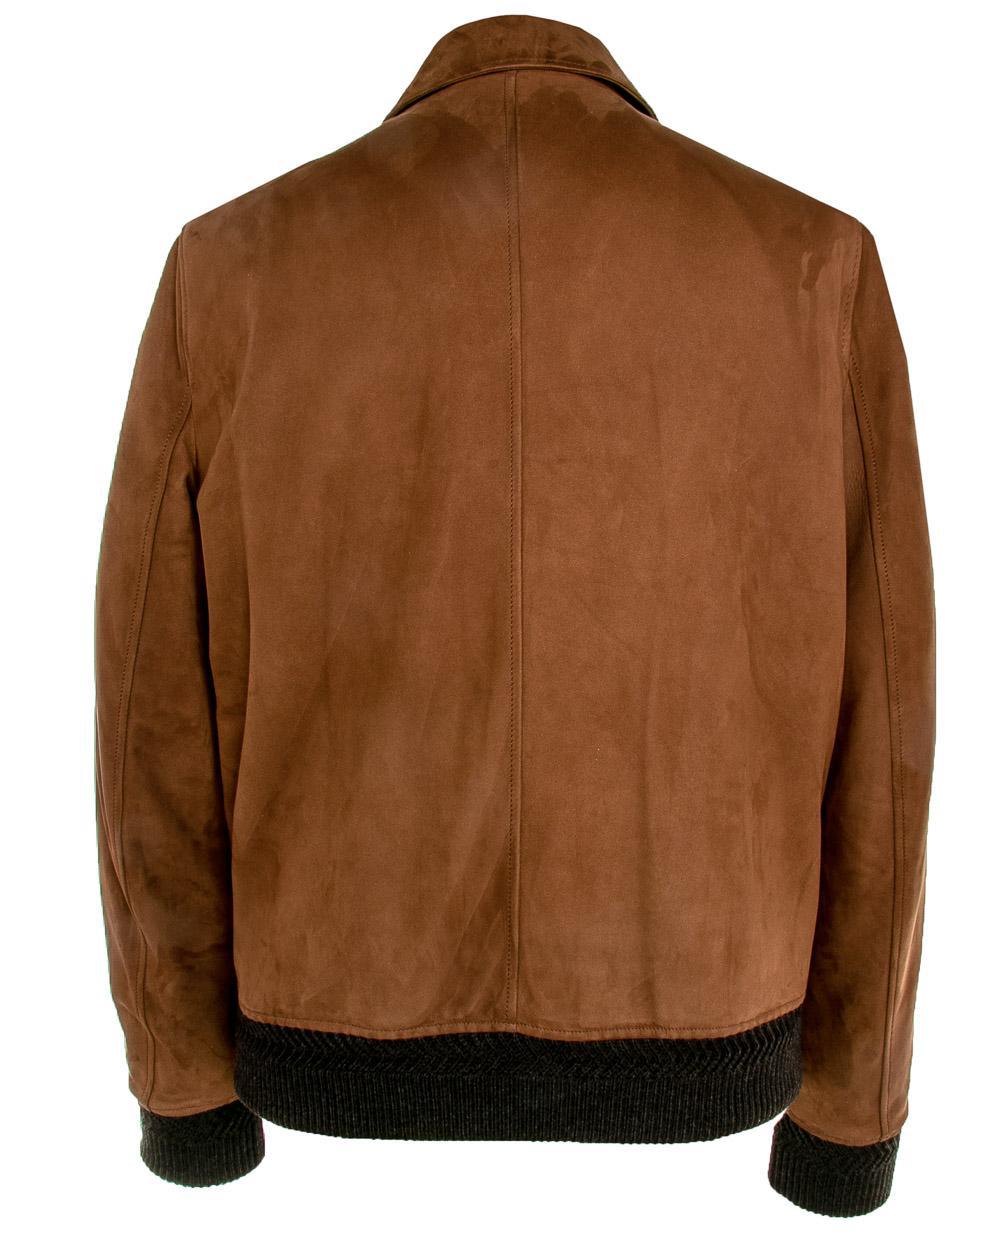 0e4ff7952ce Lyst - Ermenegildo Zegna Cognac Vicuna Suede Bomber Jacket in Brown for Men